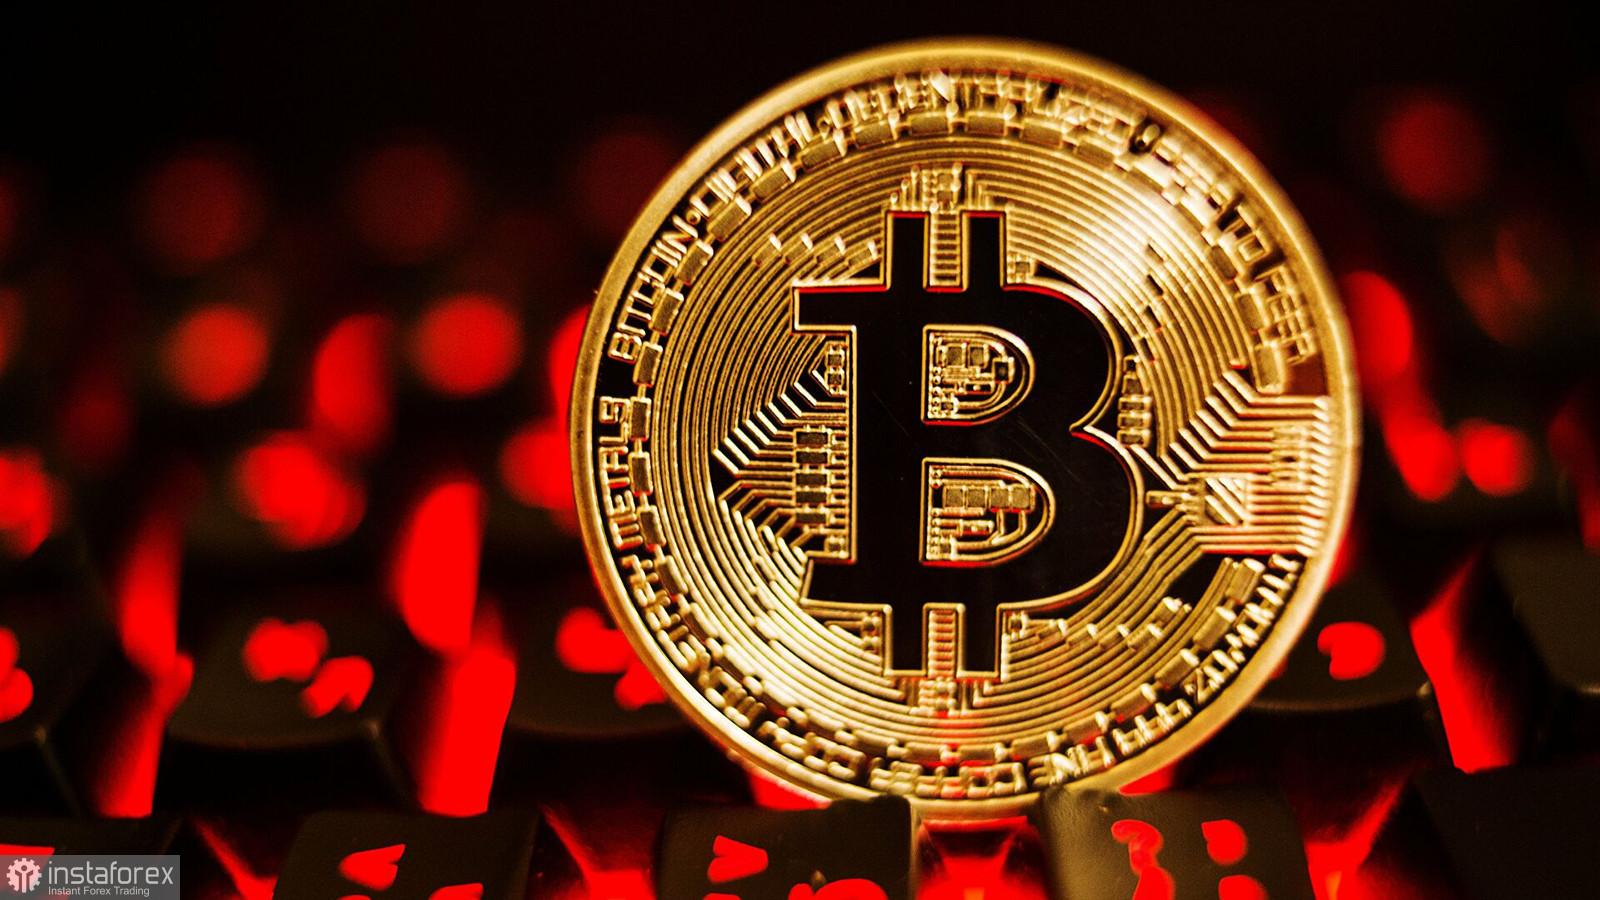 Microstrategy raising money to buy more bitcoin